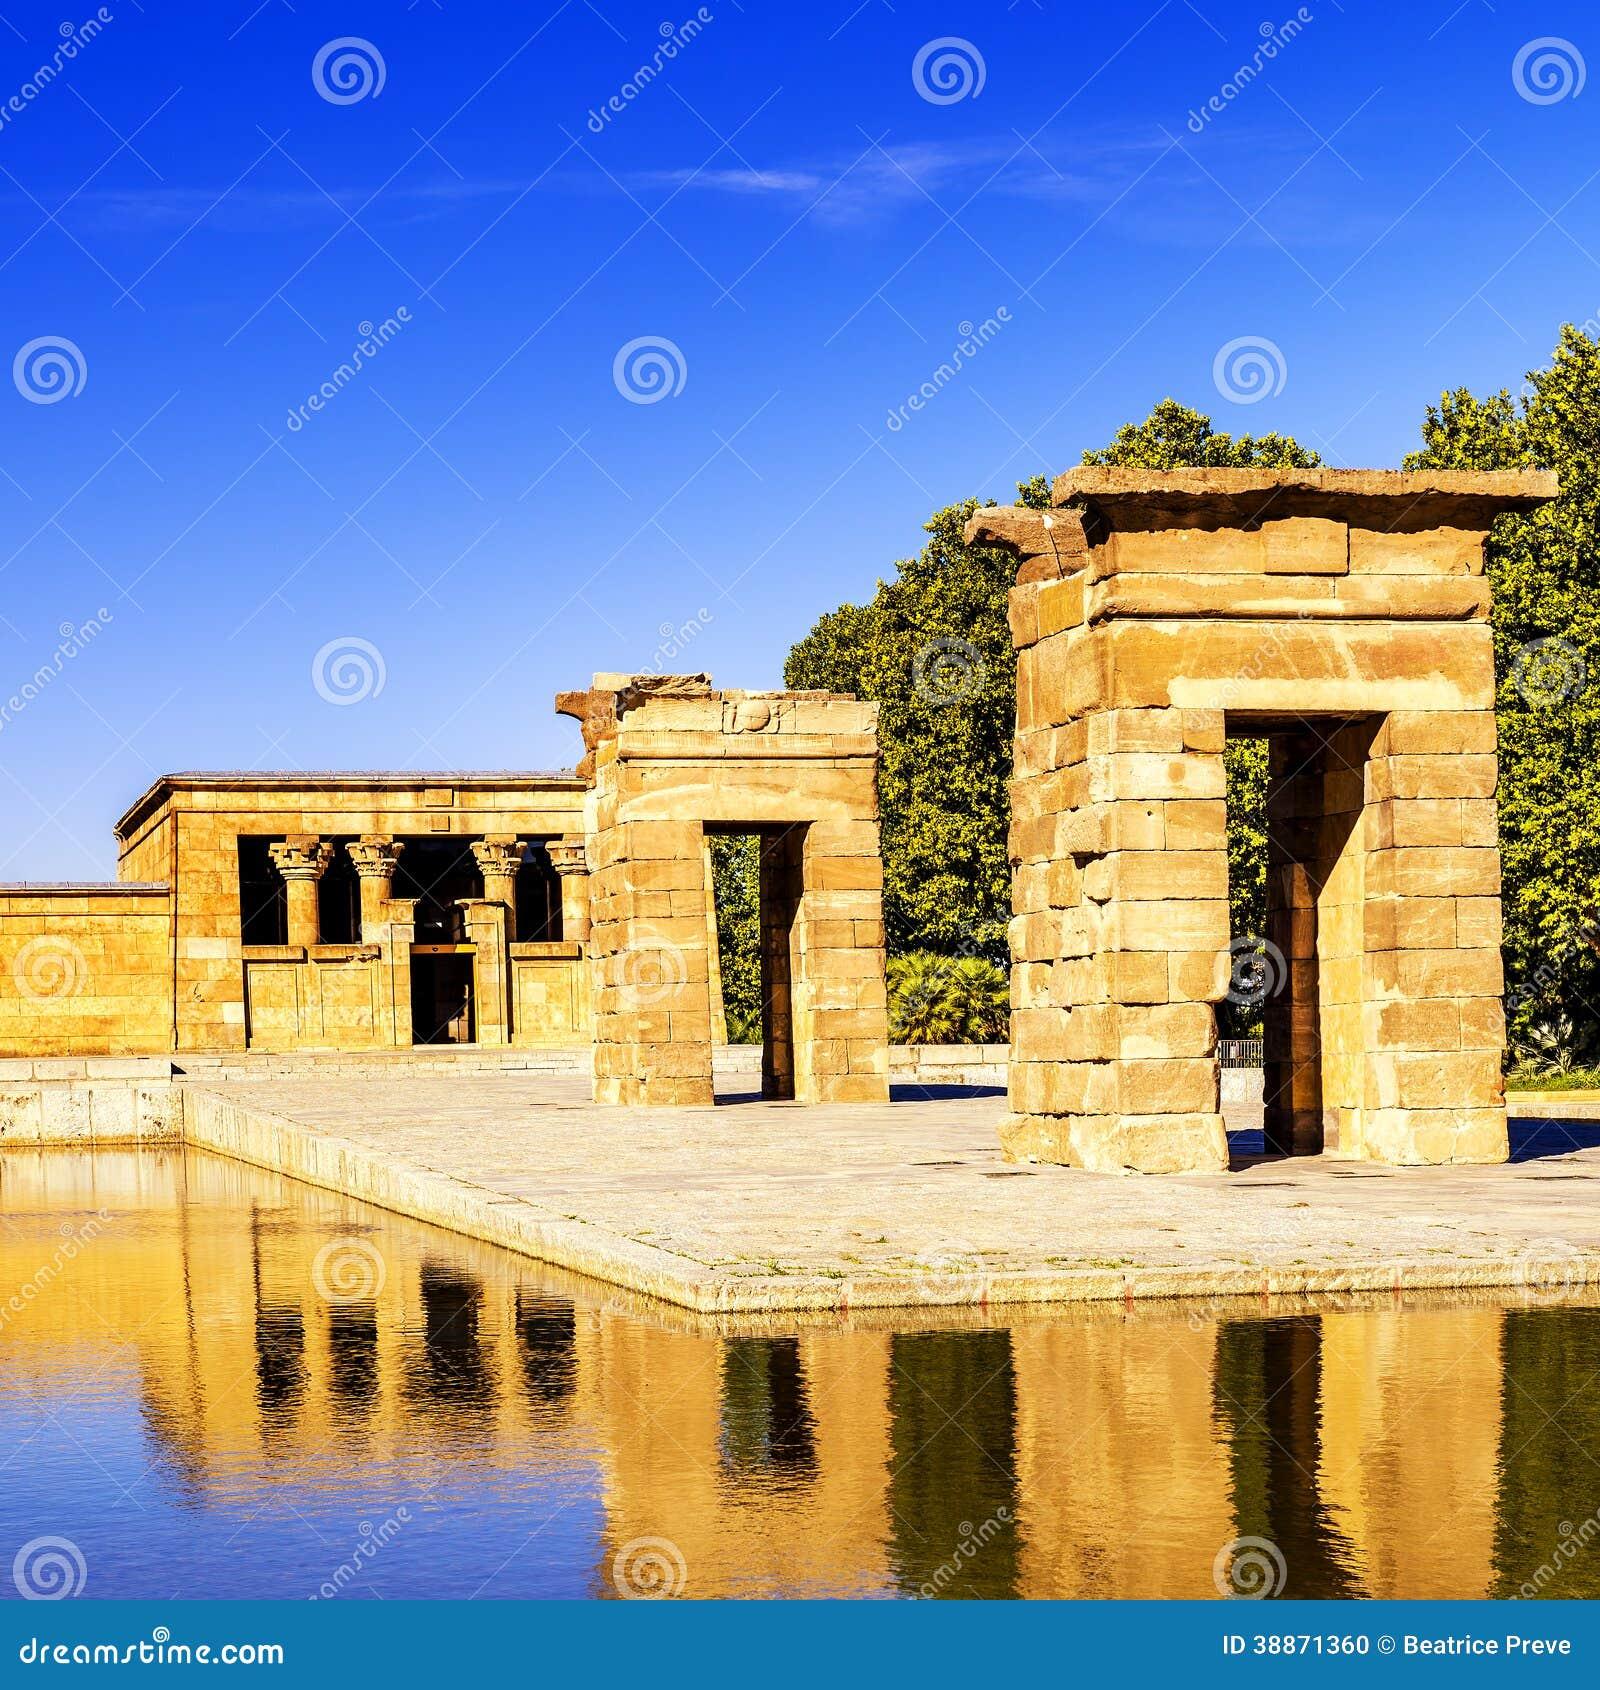 Temple Of Debod Madrid Stock Photo - Image: 38871360